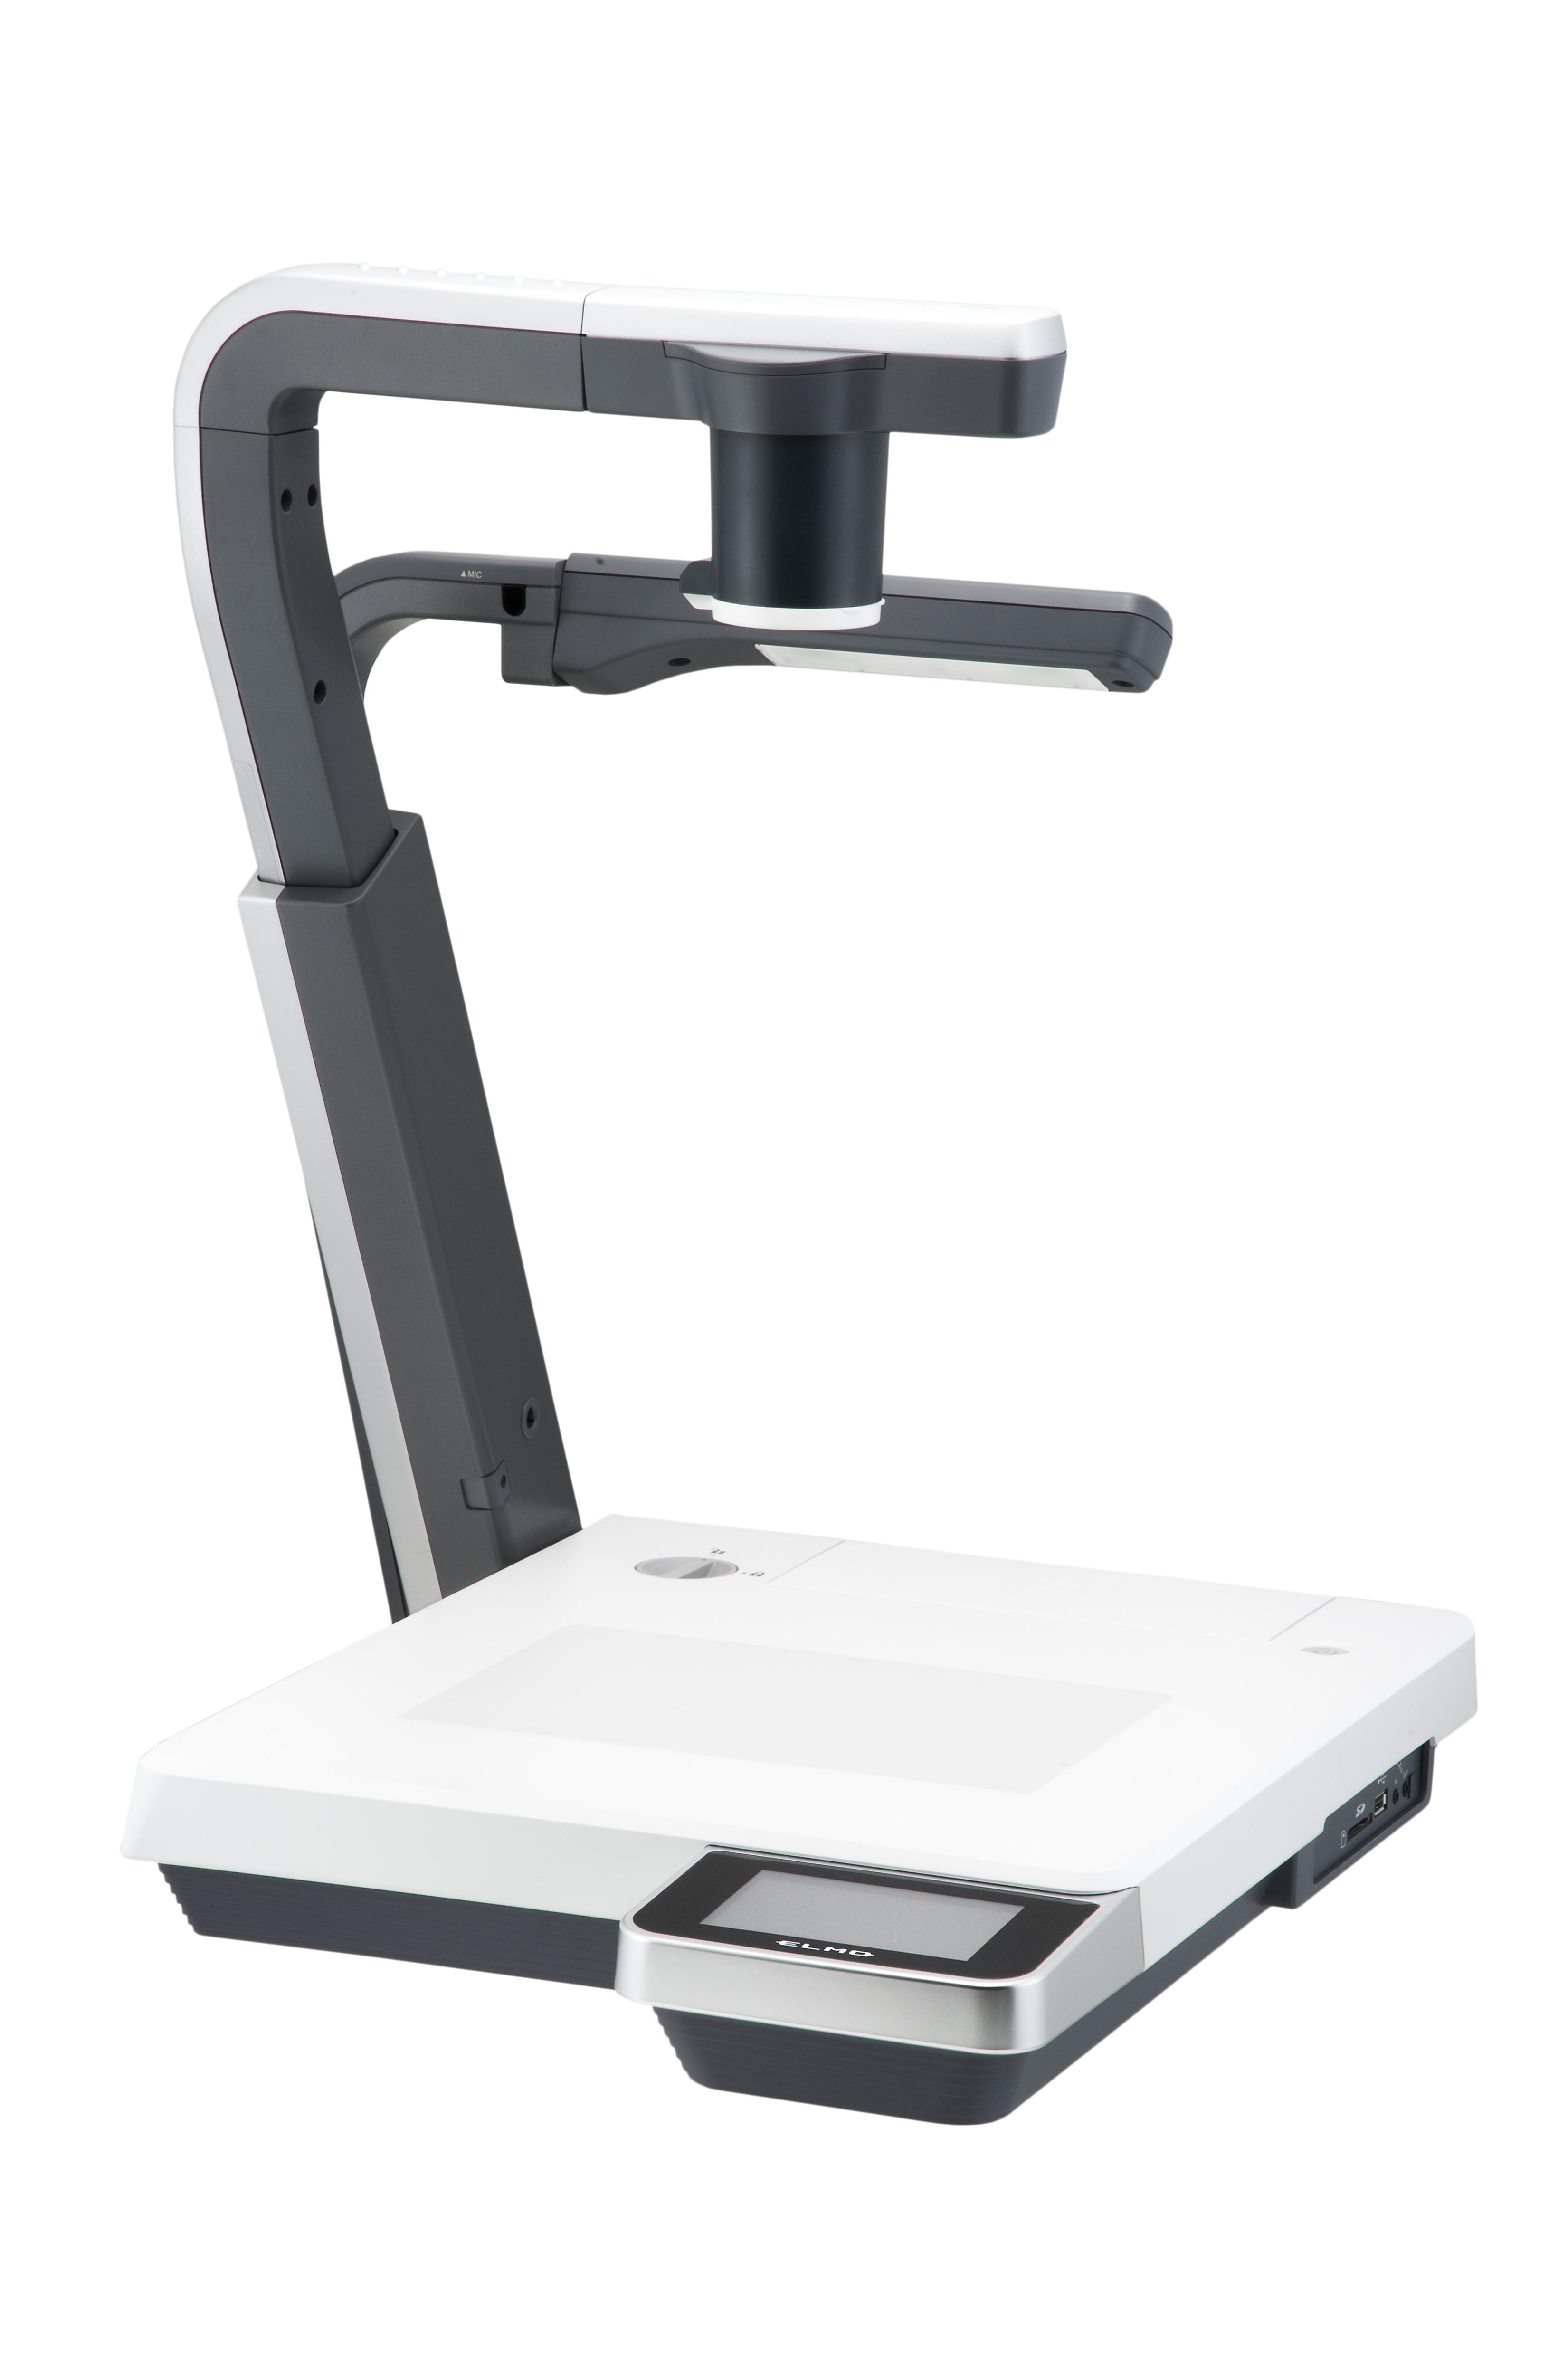 ELMO P100HD 1080p Visualizer